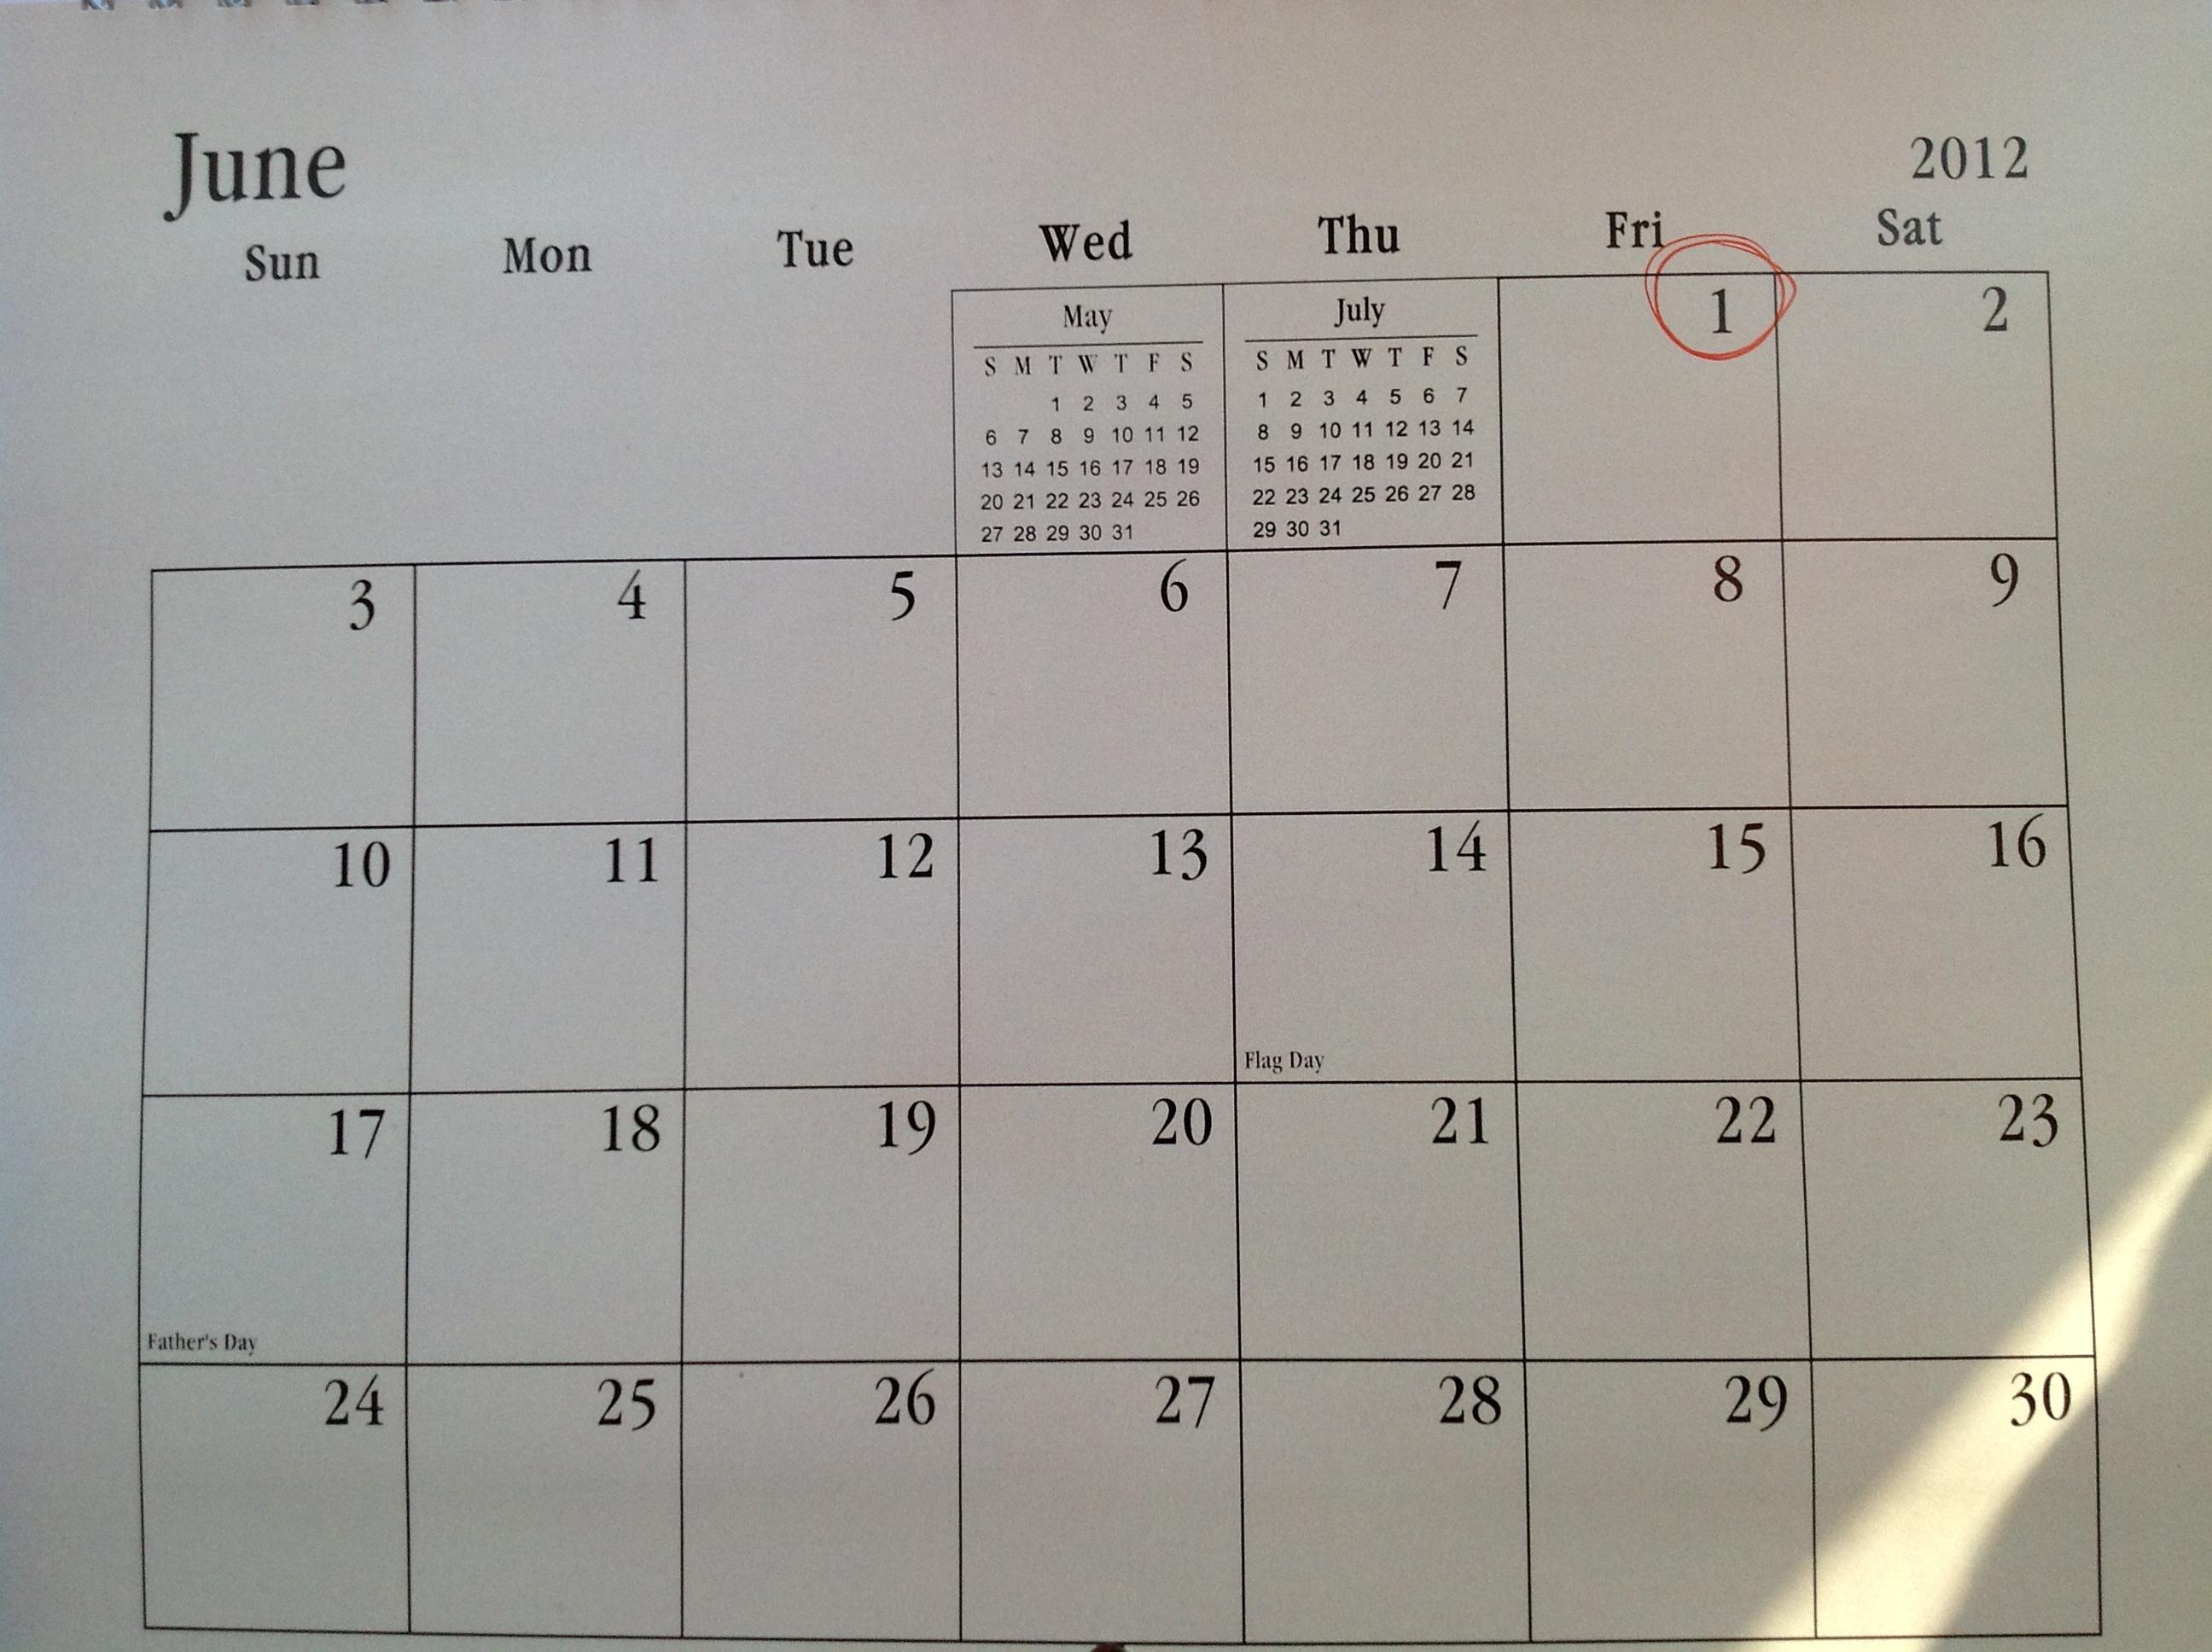 Phase II Renovation Start Date